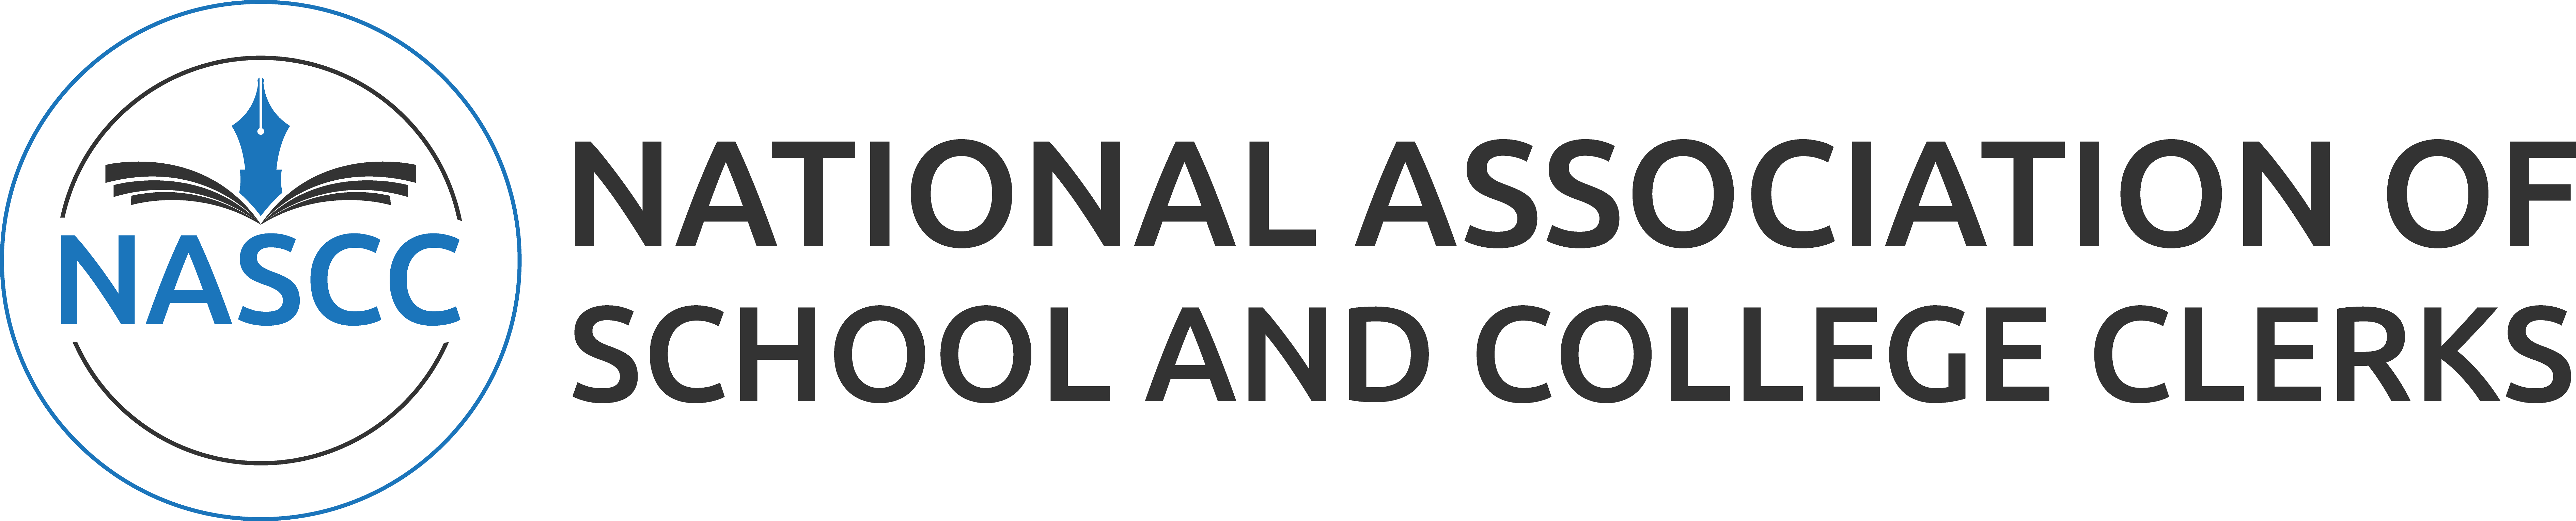 National Association of School and College Clerks website branding